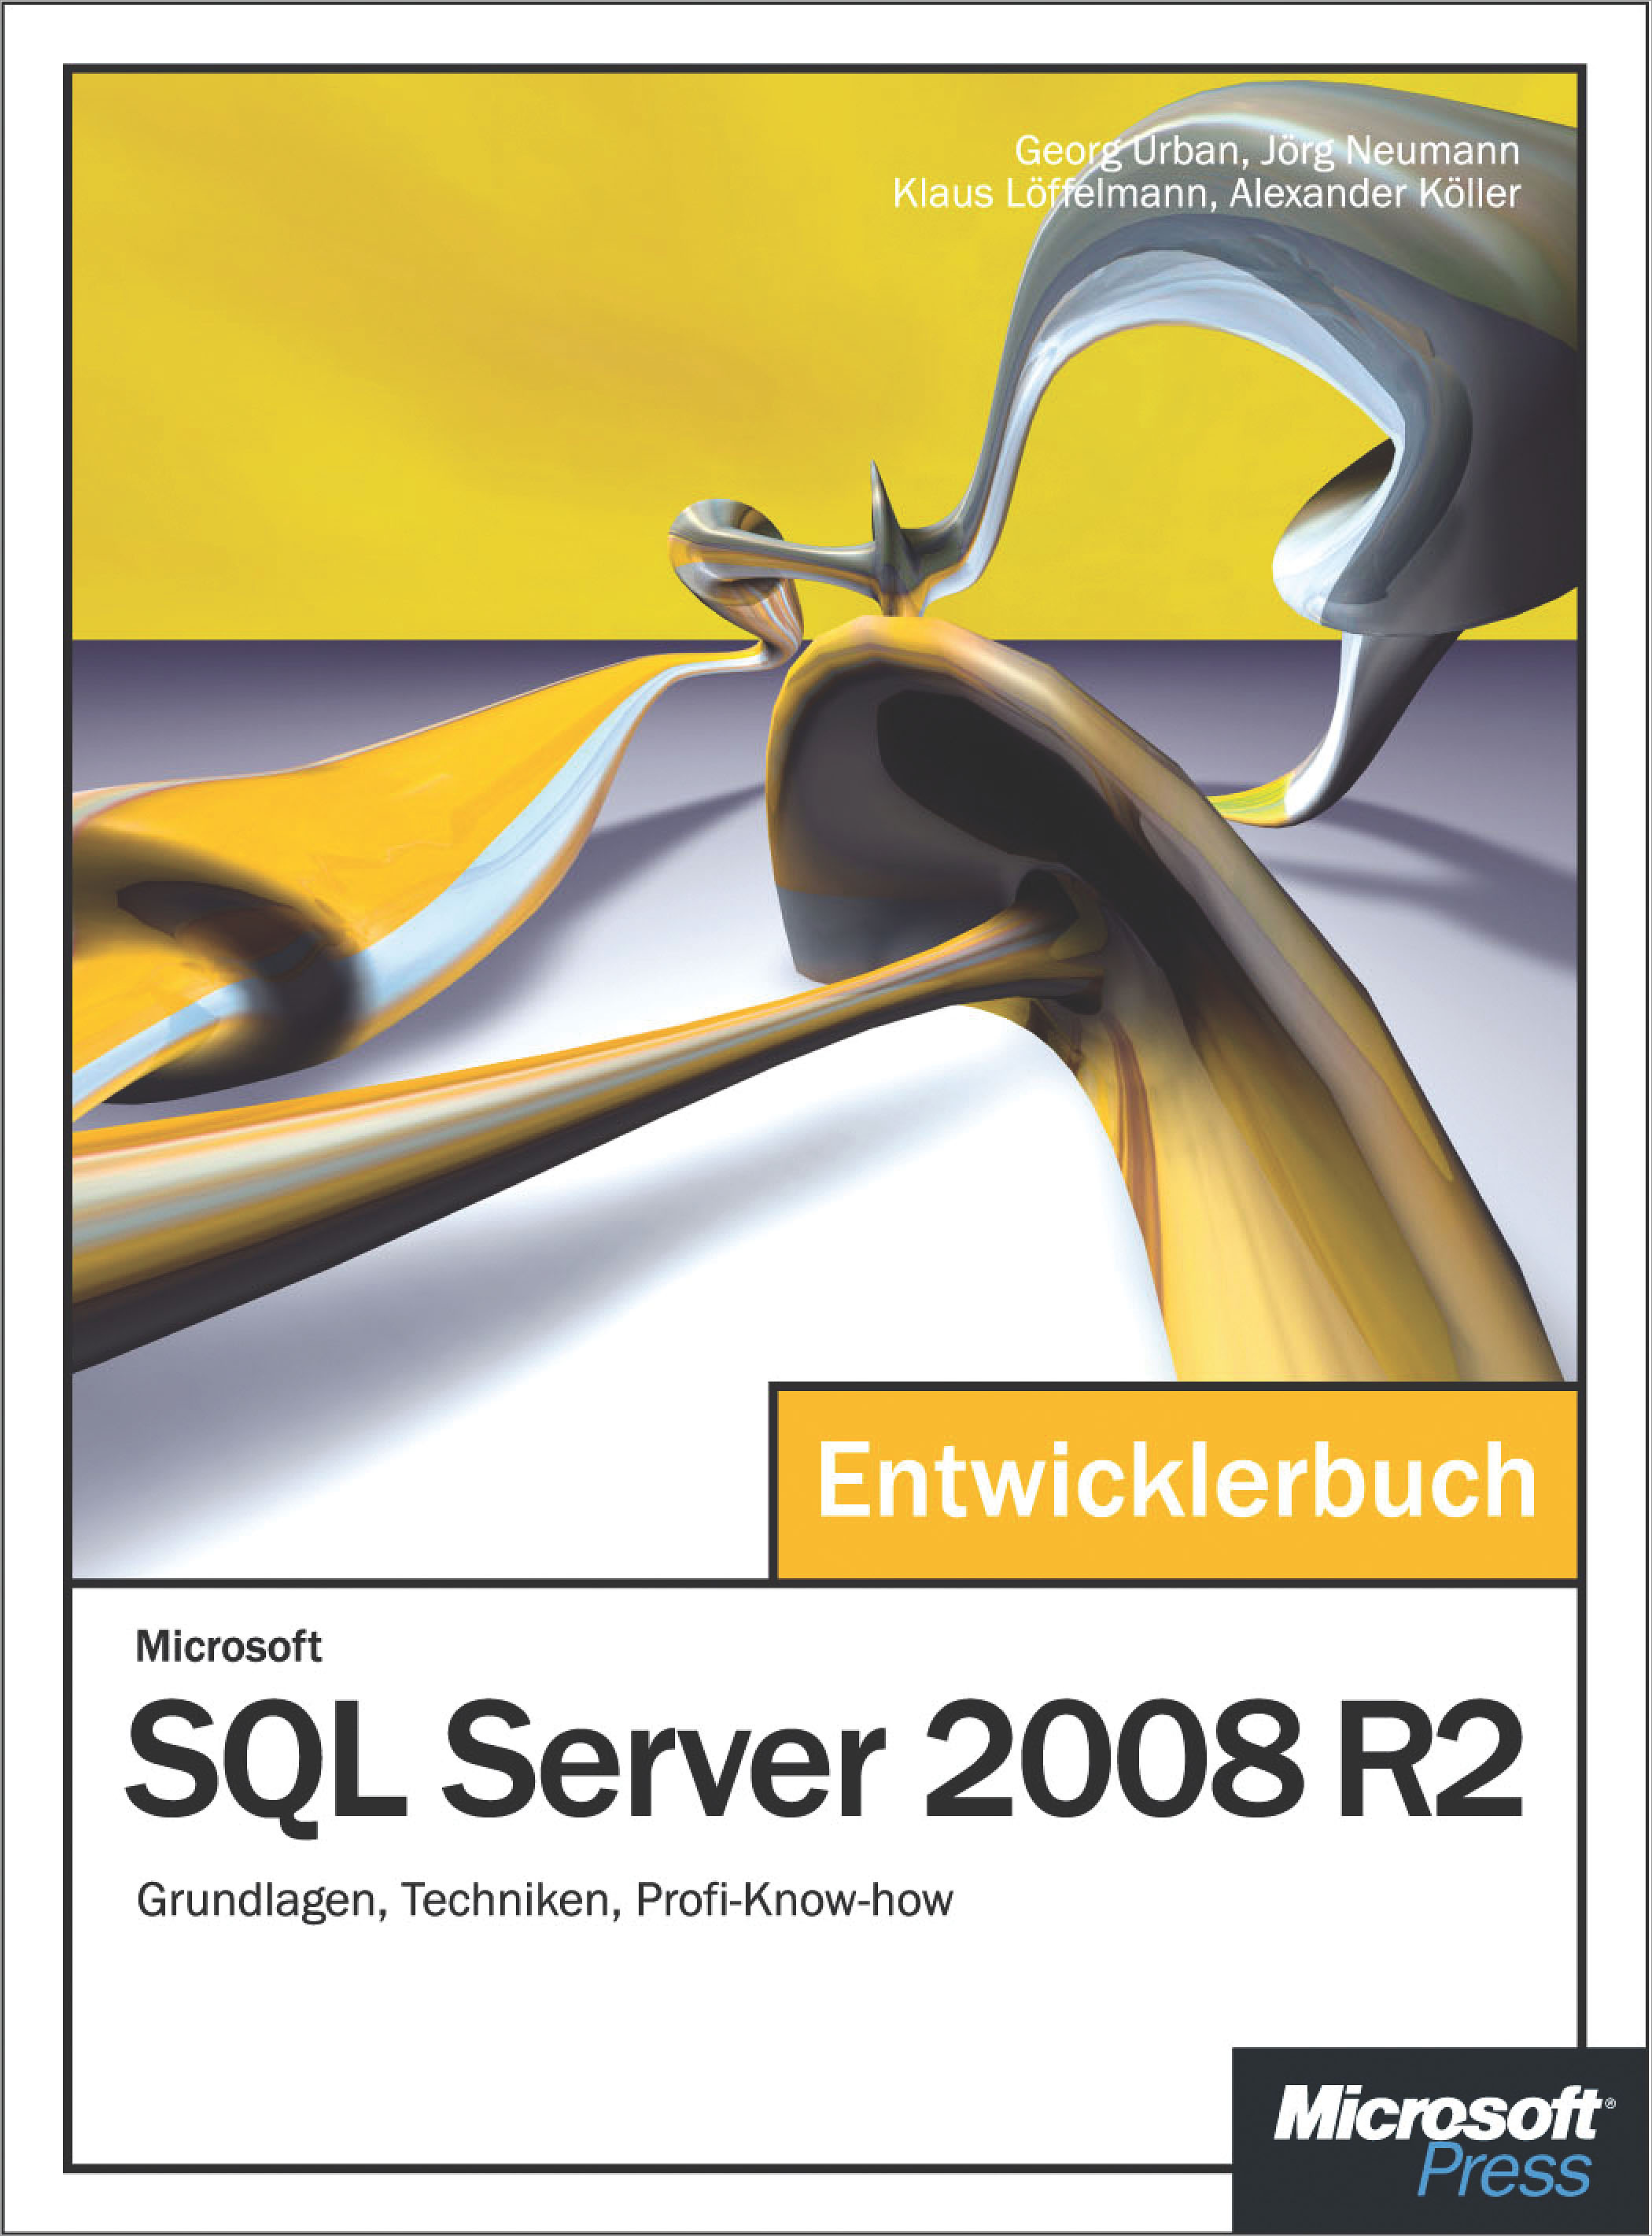 Alexander Koller Microsoft SQL Server 2008 R2 - Das Entwicklerbuch mike chapple microsoft sql server 2008 for dummies